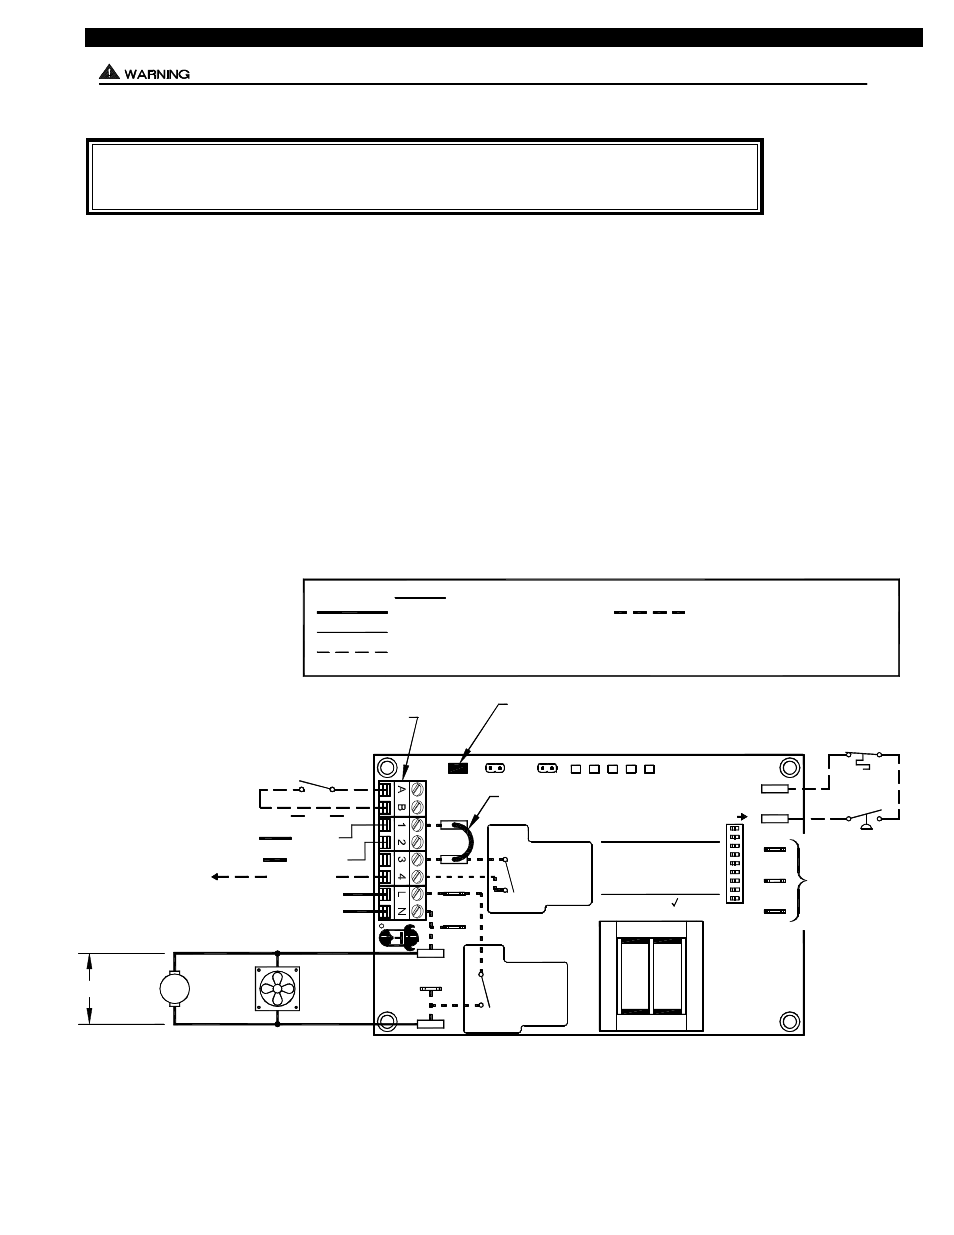 medium resolution of ss2 wiring diagram wiring diagram data name nema ss2 50p wiring diagram ss2 wiring diagram